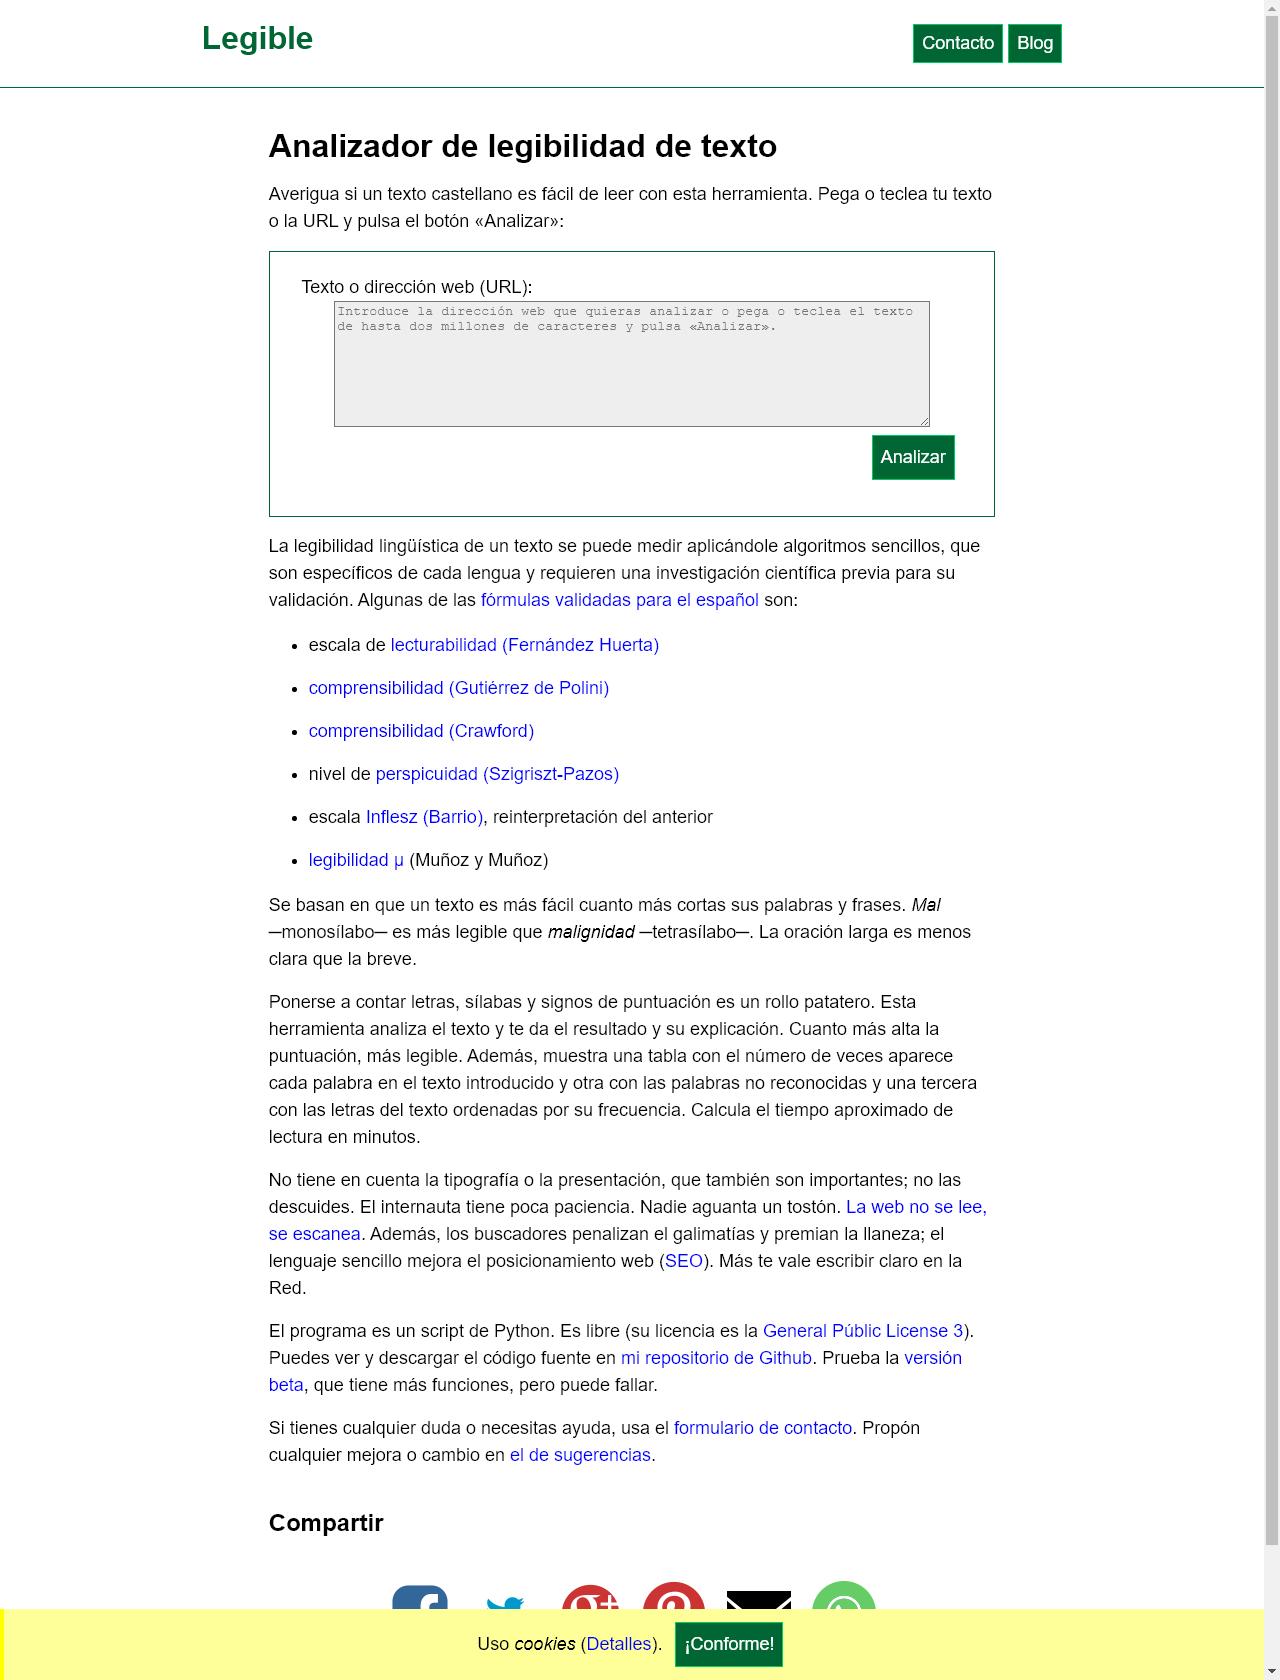 Screenshot Desktop - https://legible.es/